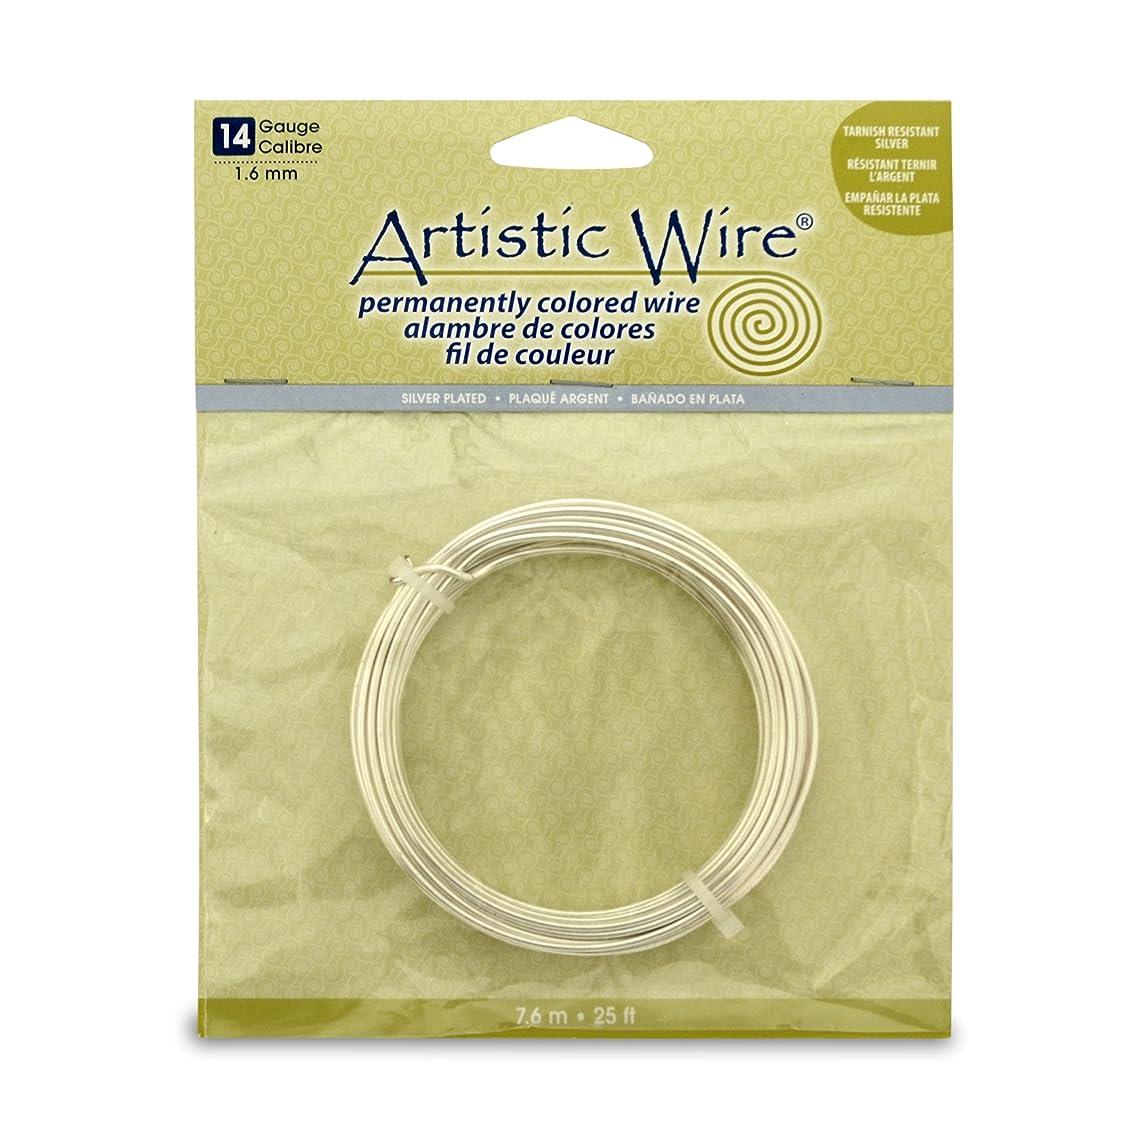 Artistic Wire 14S Gauge Wire, Tarn Resist Silver, 25-Feet